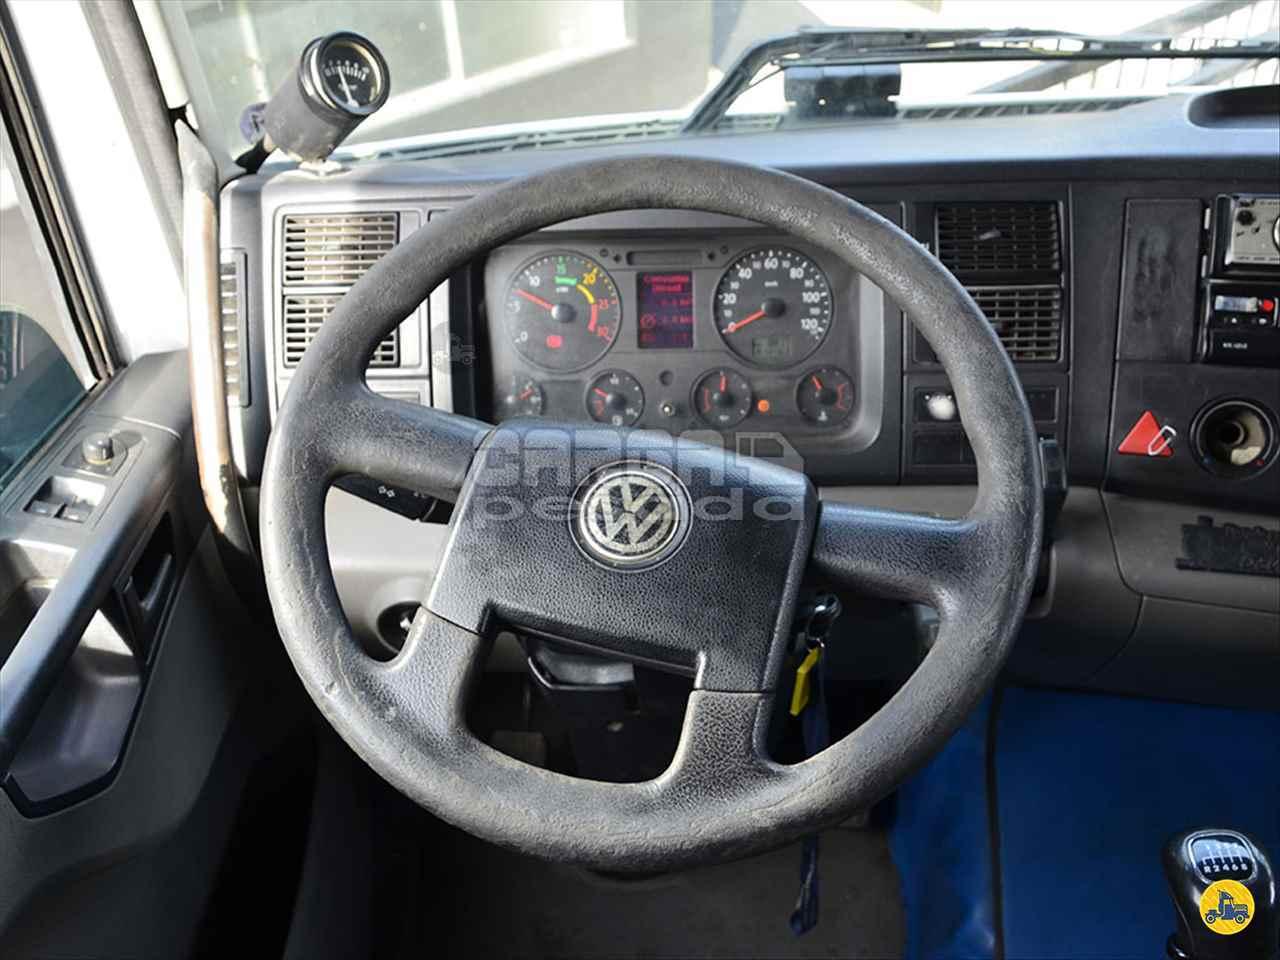 VOLKSWAGEN VW 19320  2008/2008 Carga Pesada Caminhões